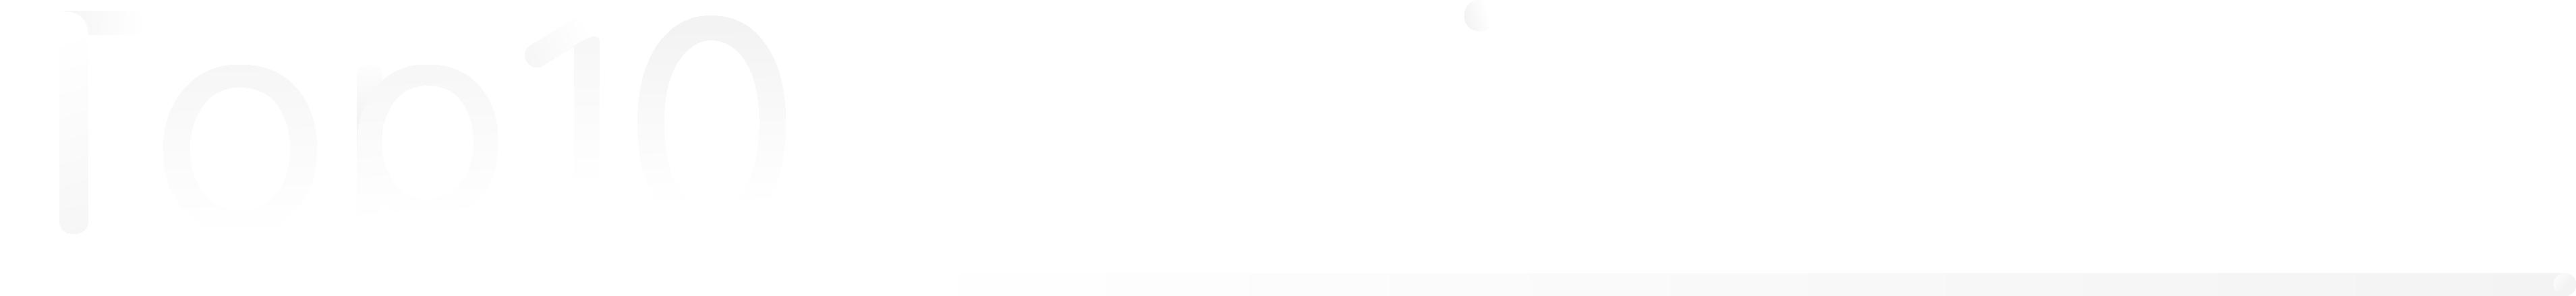 Top10MobileBanksSmall